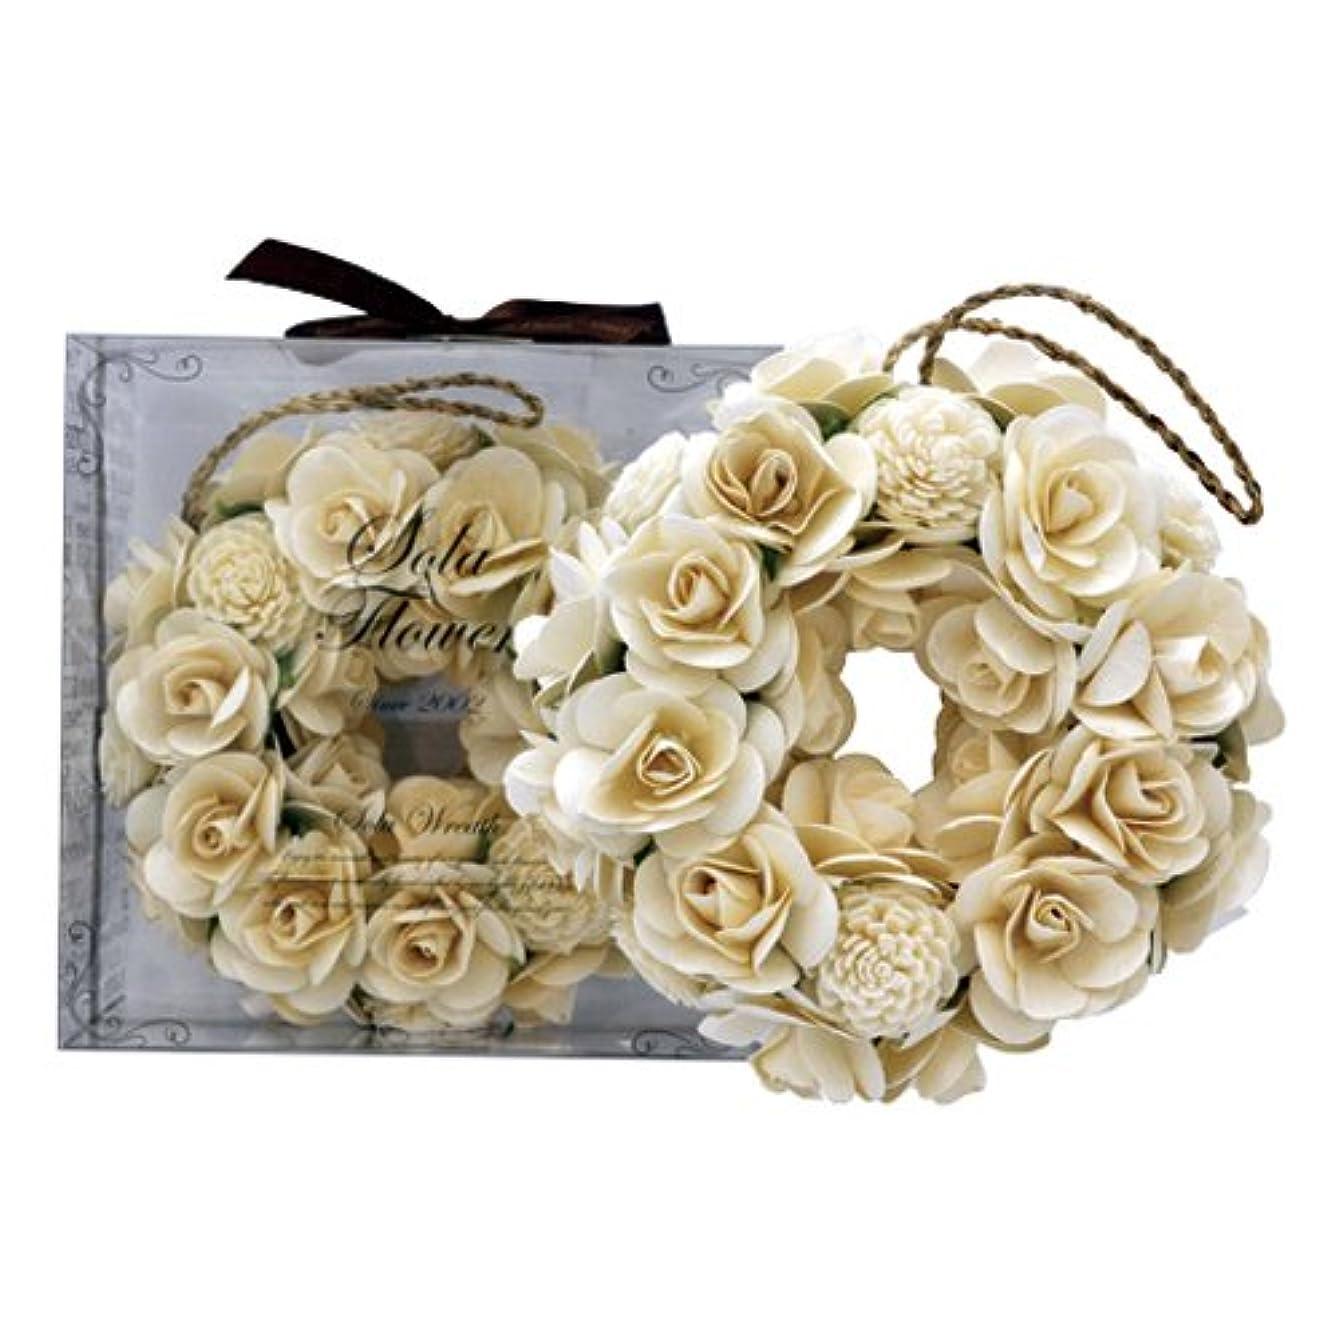 new Sola Flower ソラフラワー リース Sweet Dahlia スウィートダリア Wreath